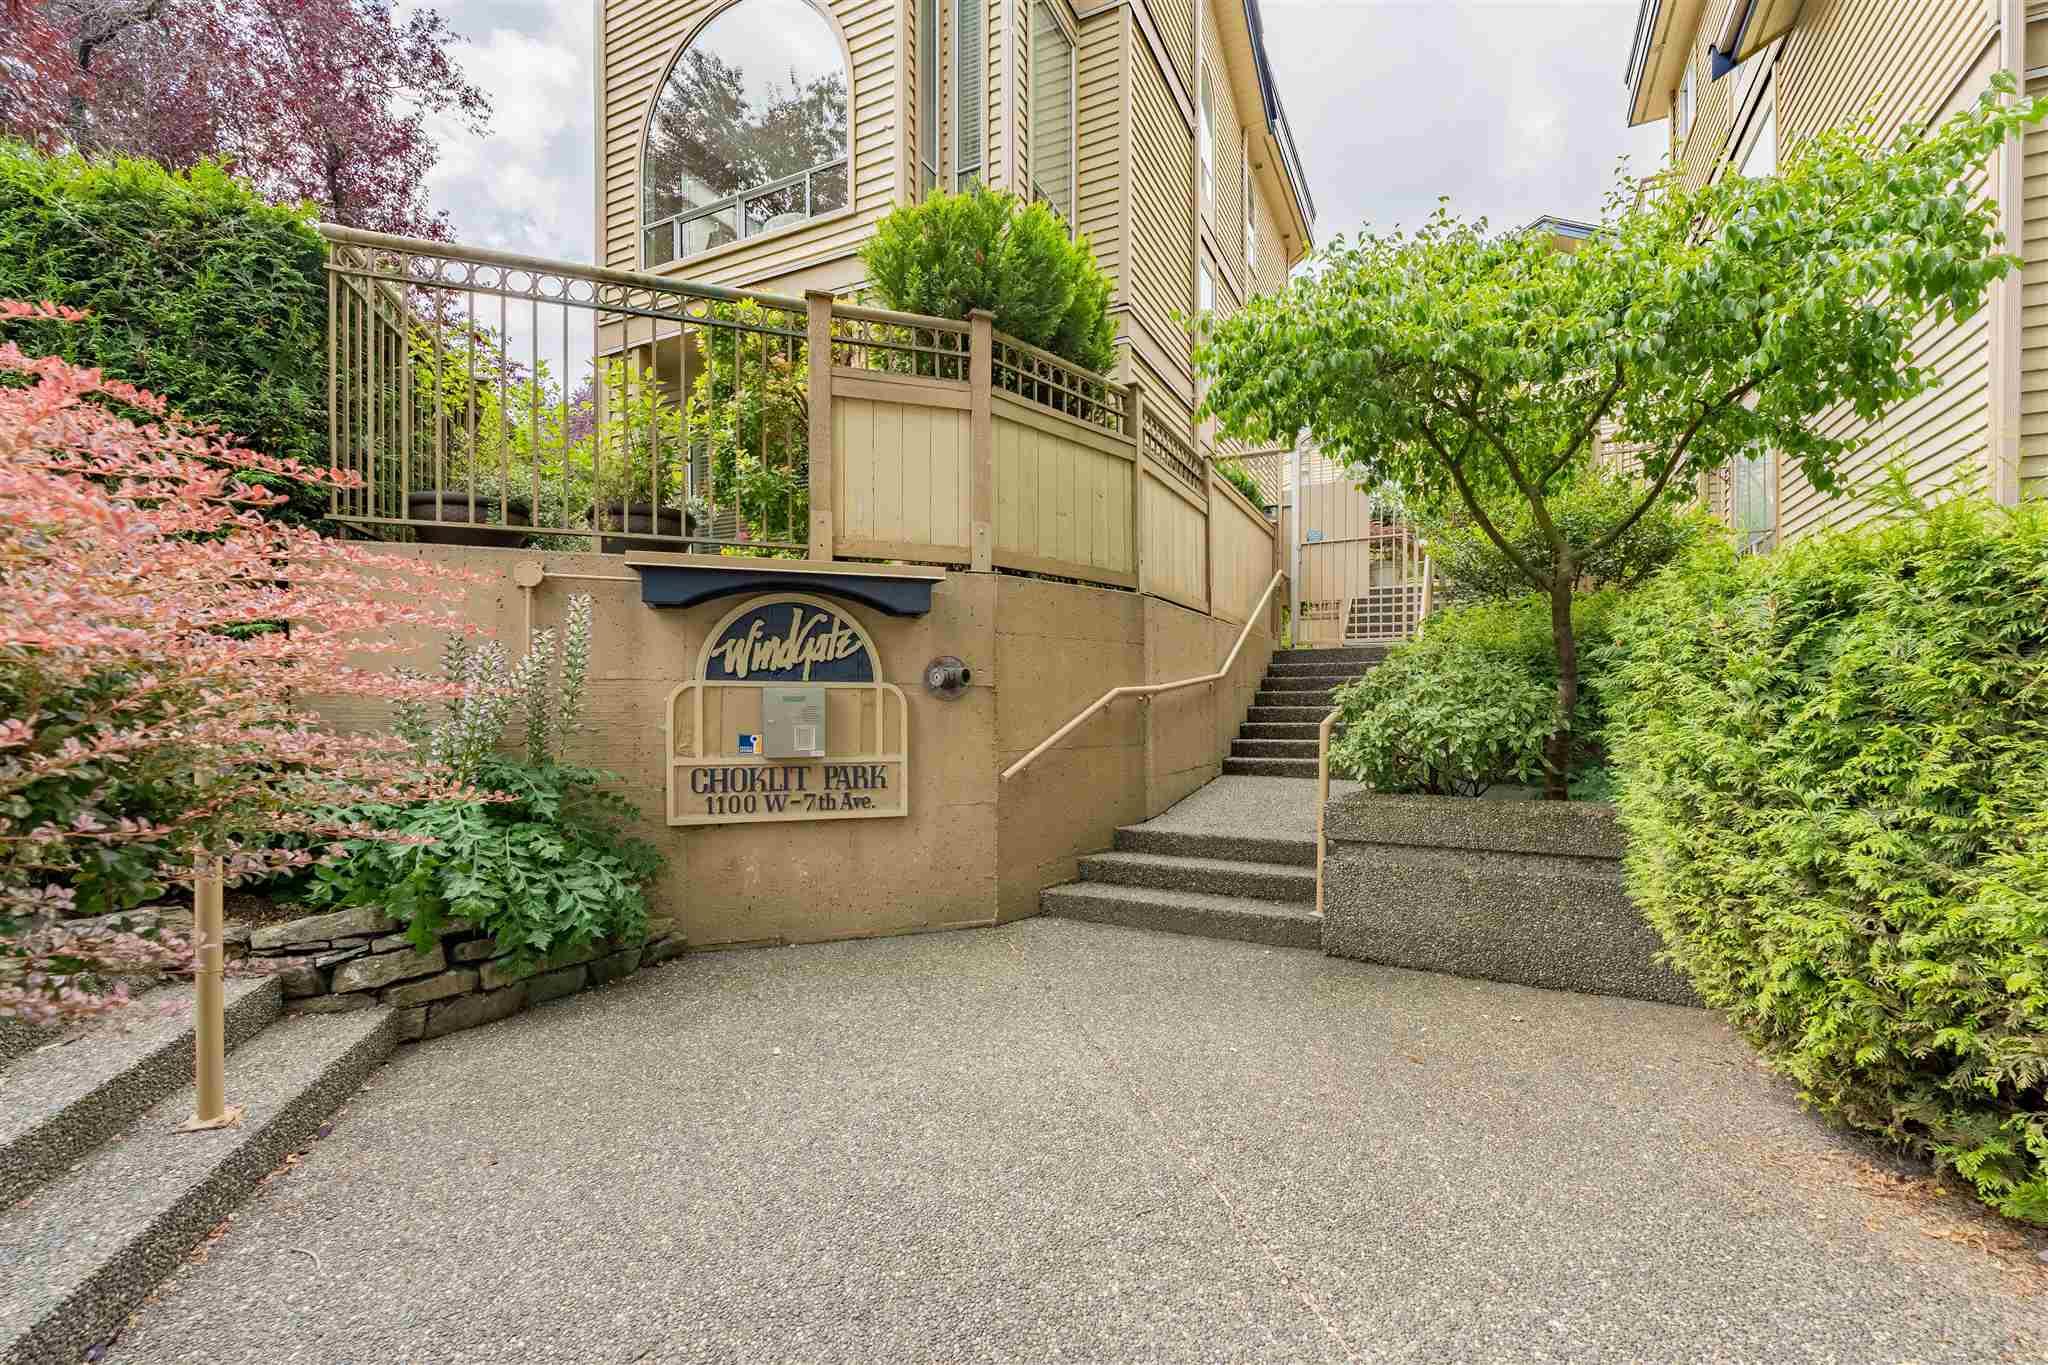 202 1100 W 7TH AVENUE - Fairview VW Apartment/Condo for sale, 1 Bedroom (R2604490) - #1